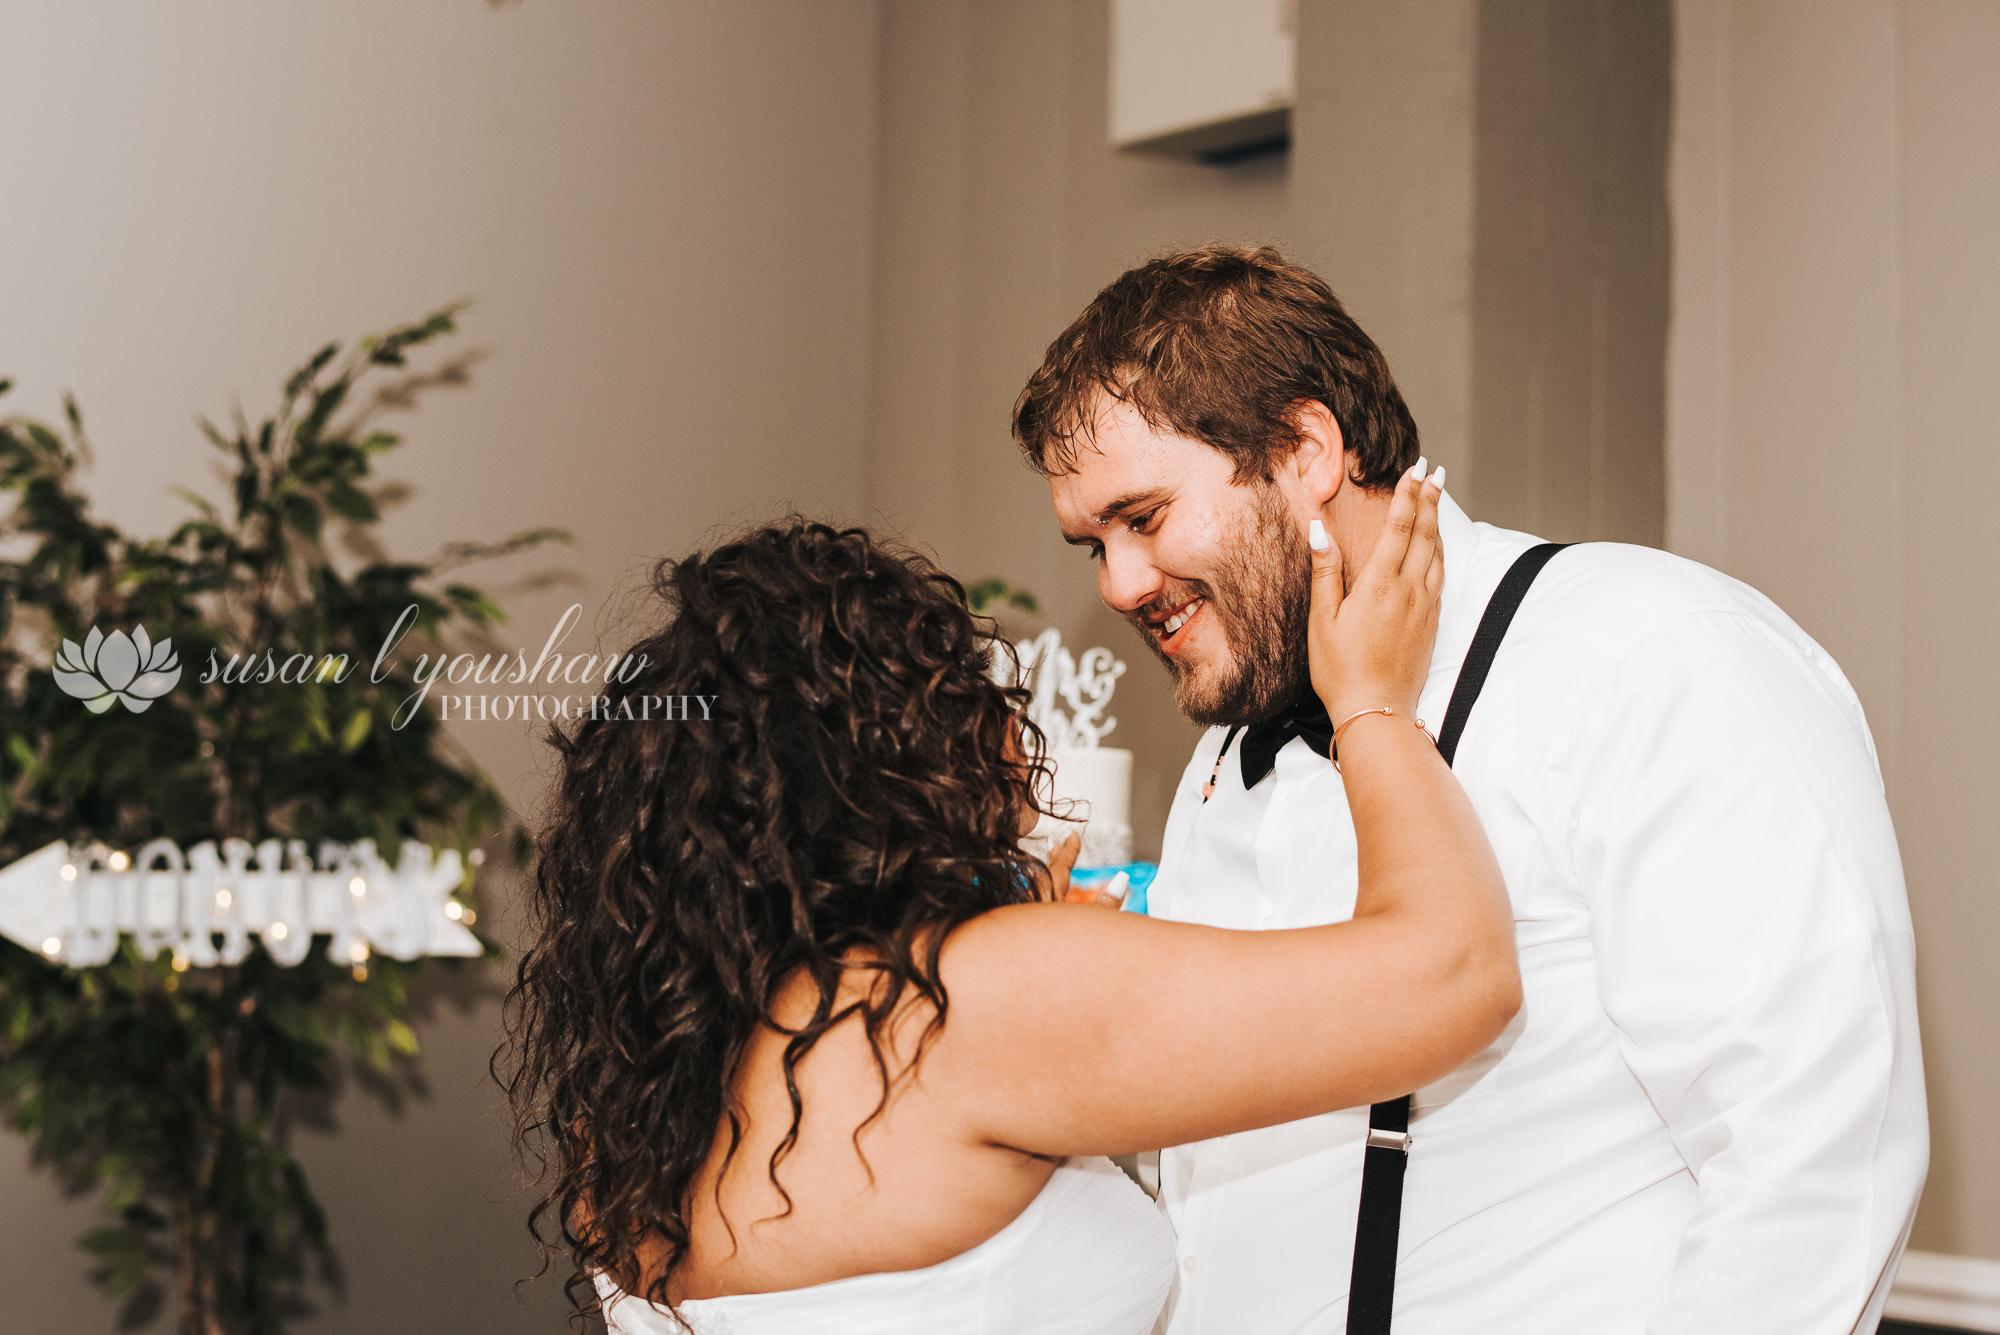 Katelyn and Wes Wedding Photos 07-13-2019 SLY Photography-110.jpg